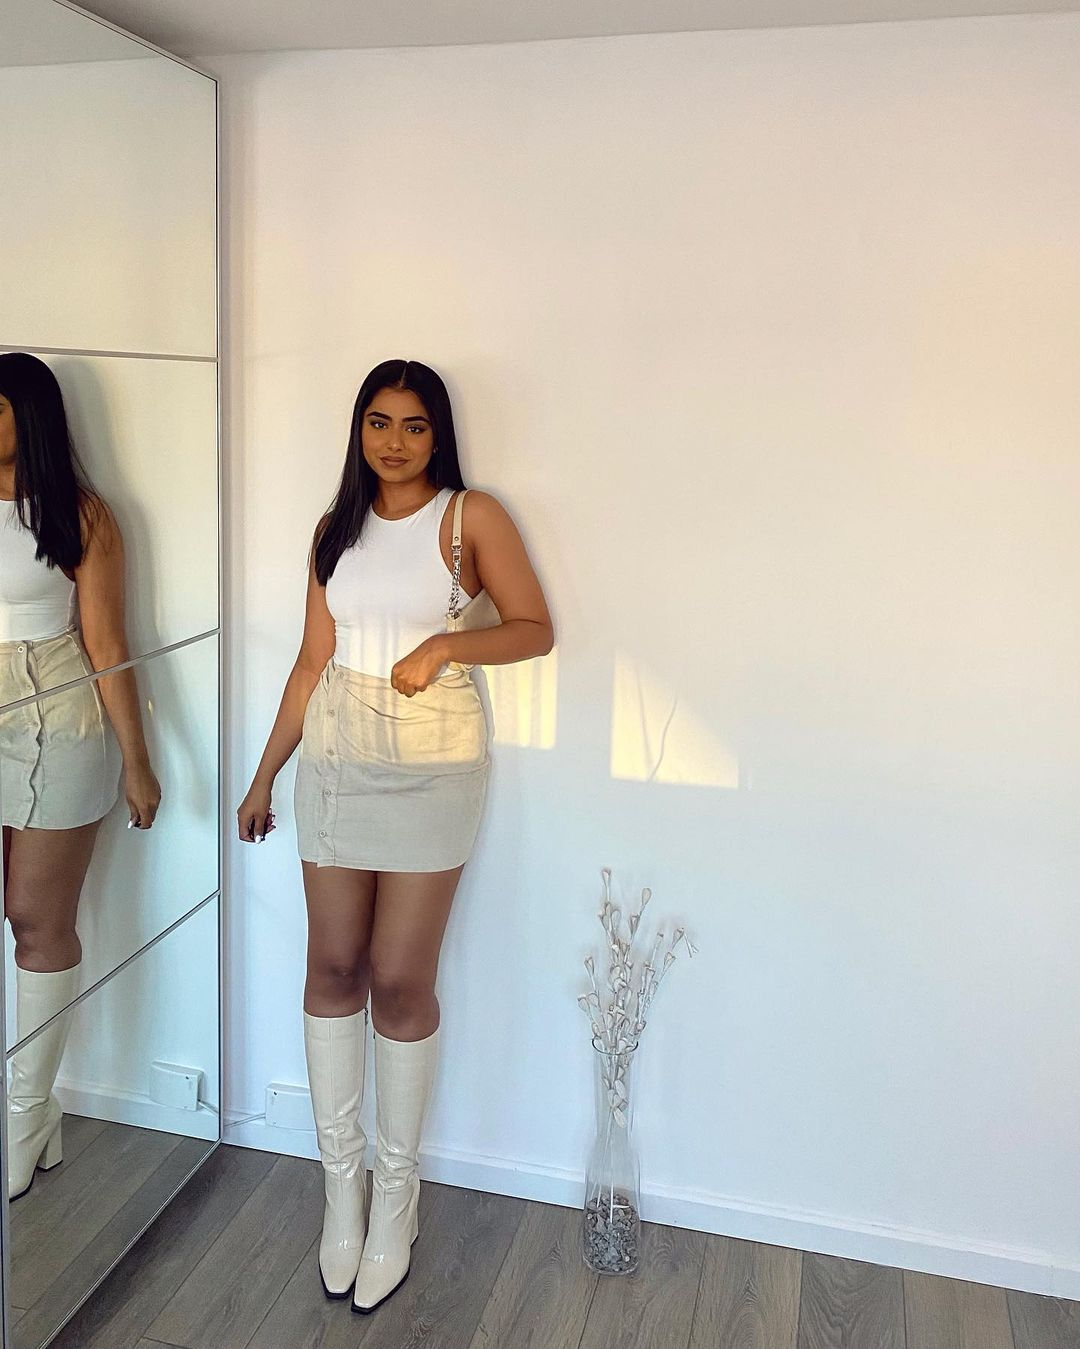 Soniaa-jay-Wallpapers-Insta-Fit-Bio-10